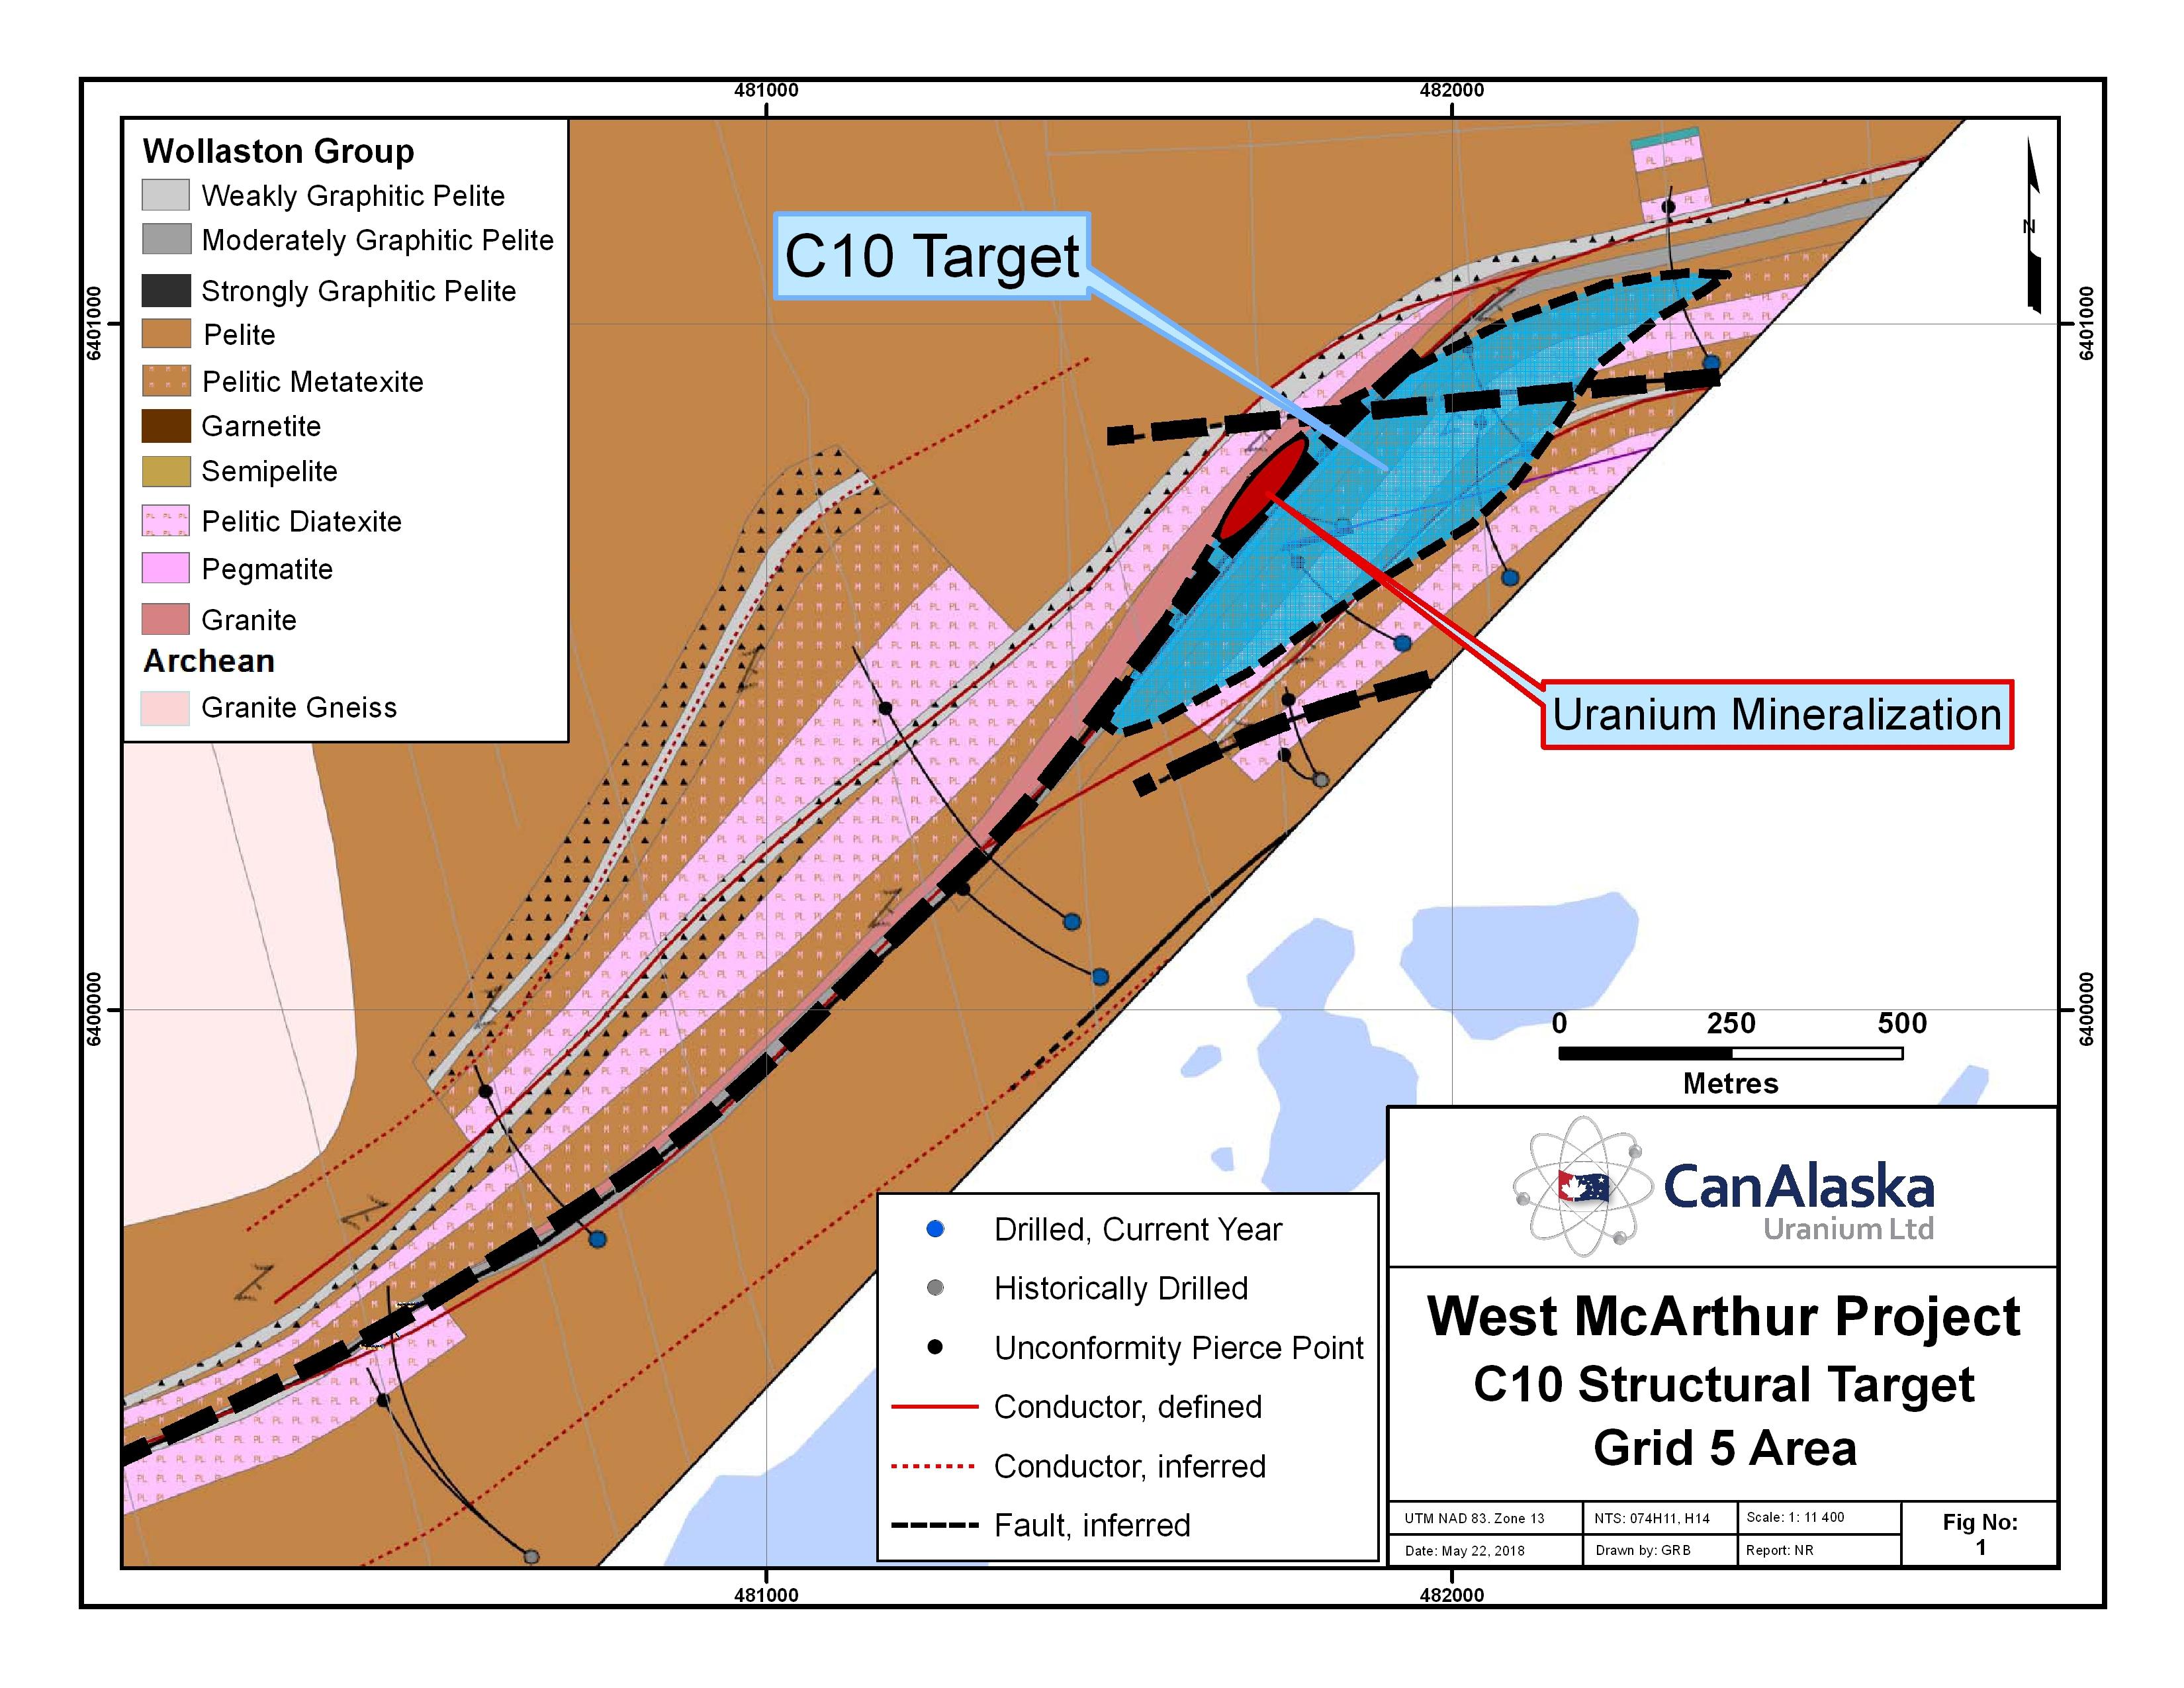 CanAlaska Uranium, Cameco make headway at West McArthur project